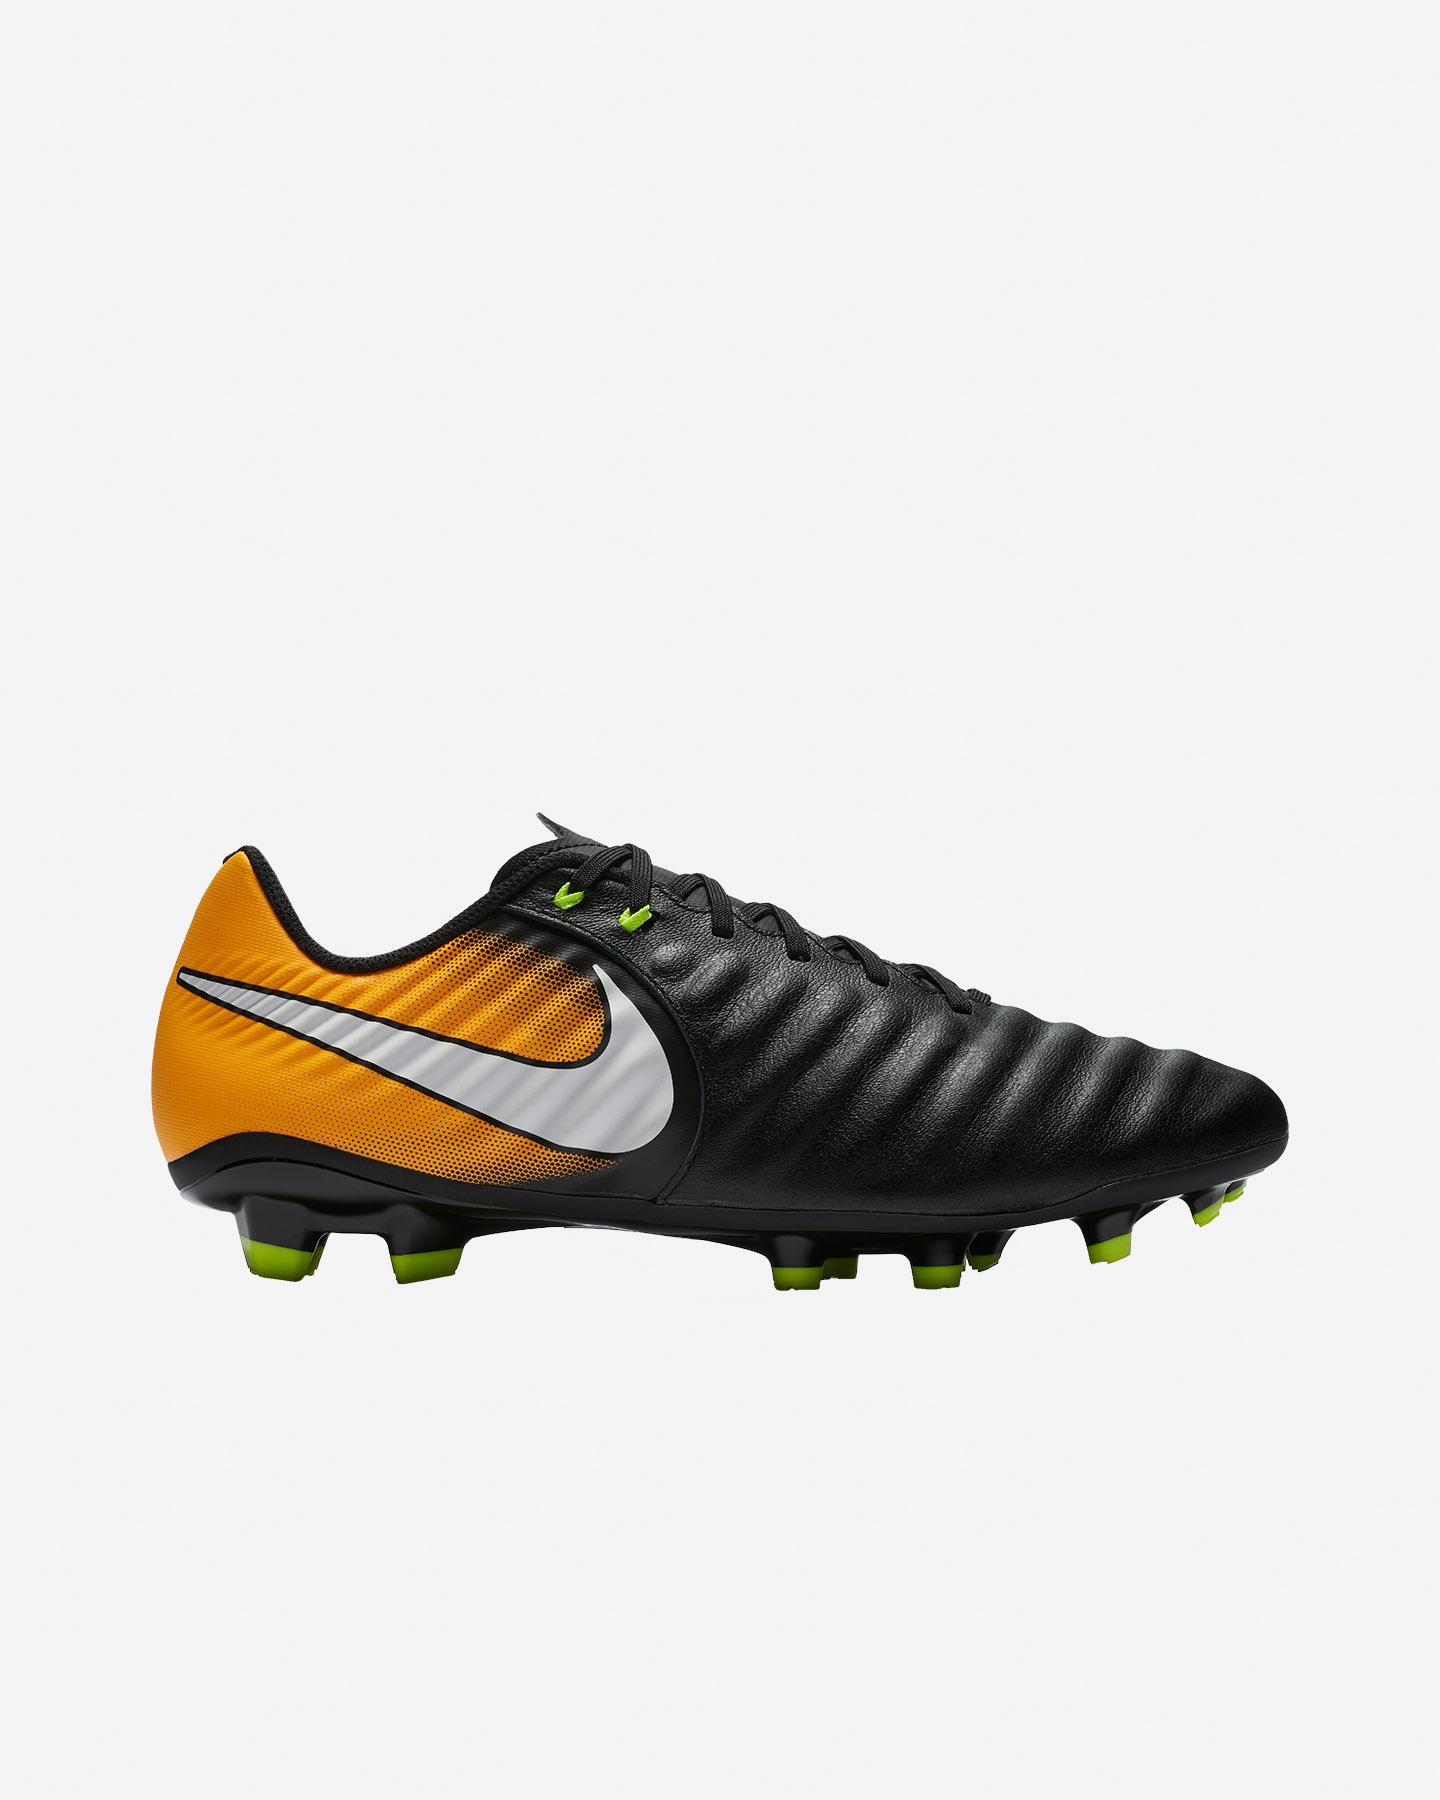 4c8c9ba6d1acea Acquista scarpe calcio nike tiempo - OFF78% sconti